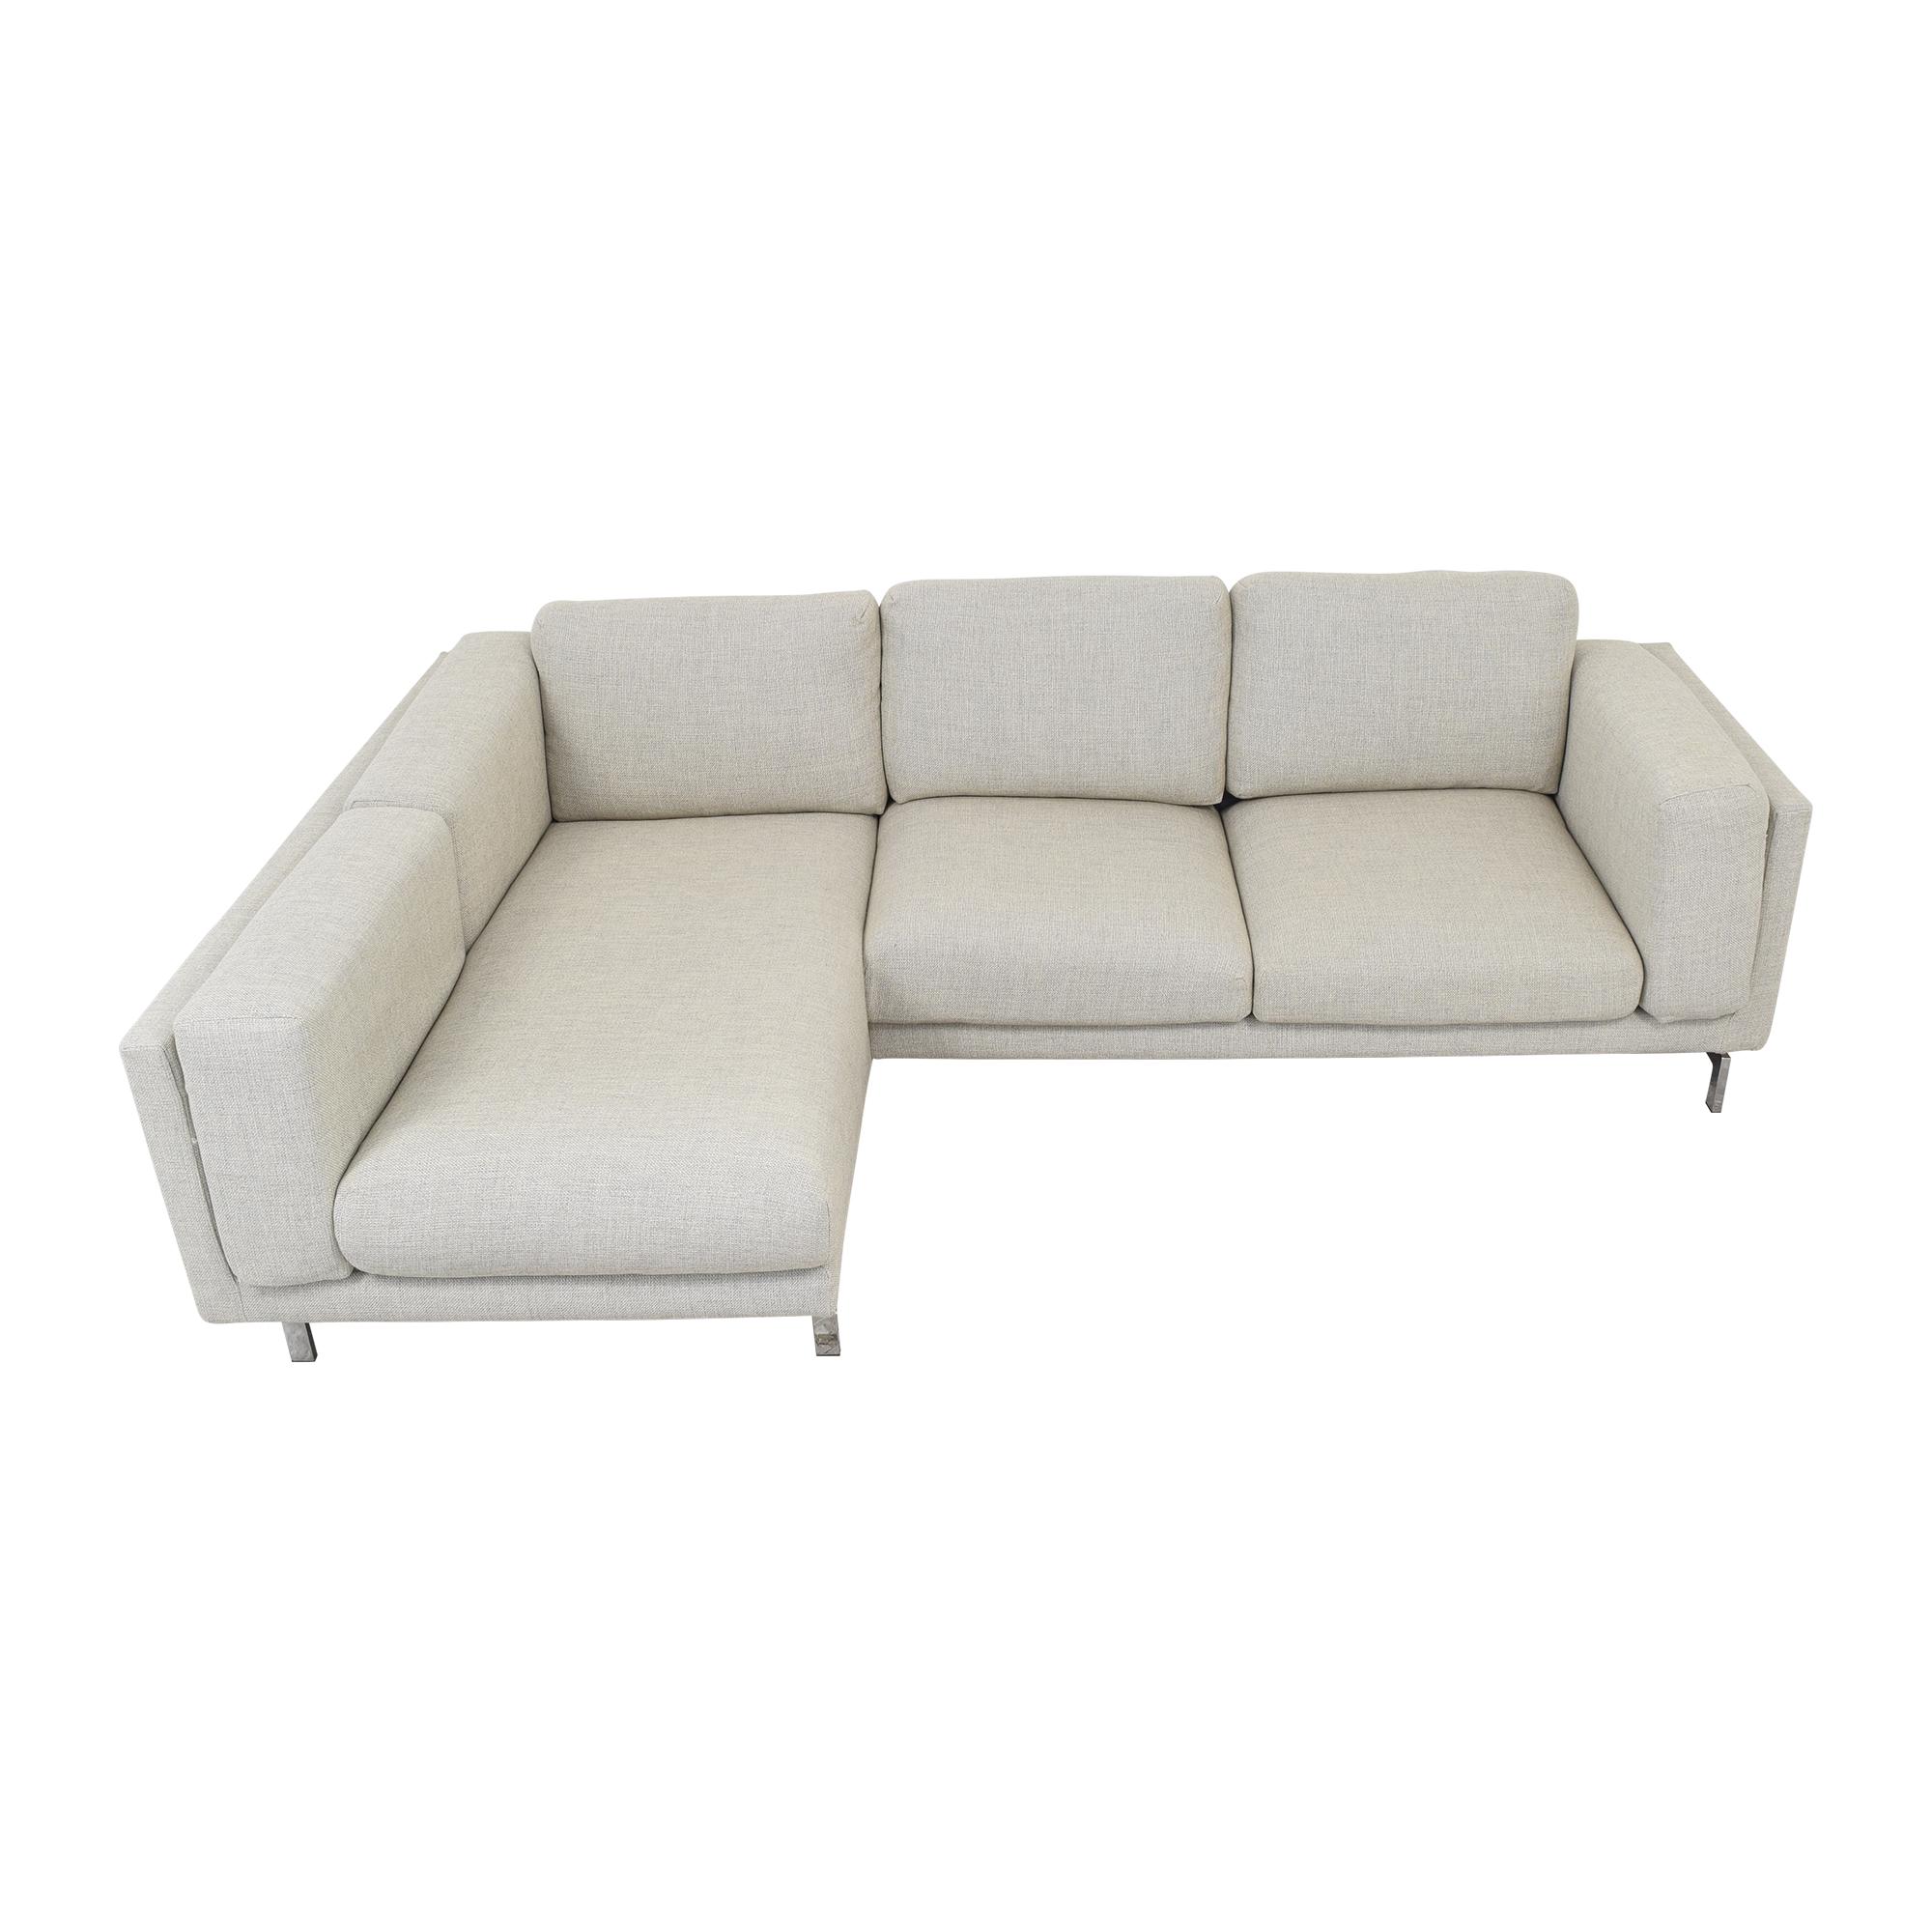 IKEA IKEA Nockeby Three Seat Sofa ct